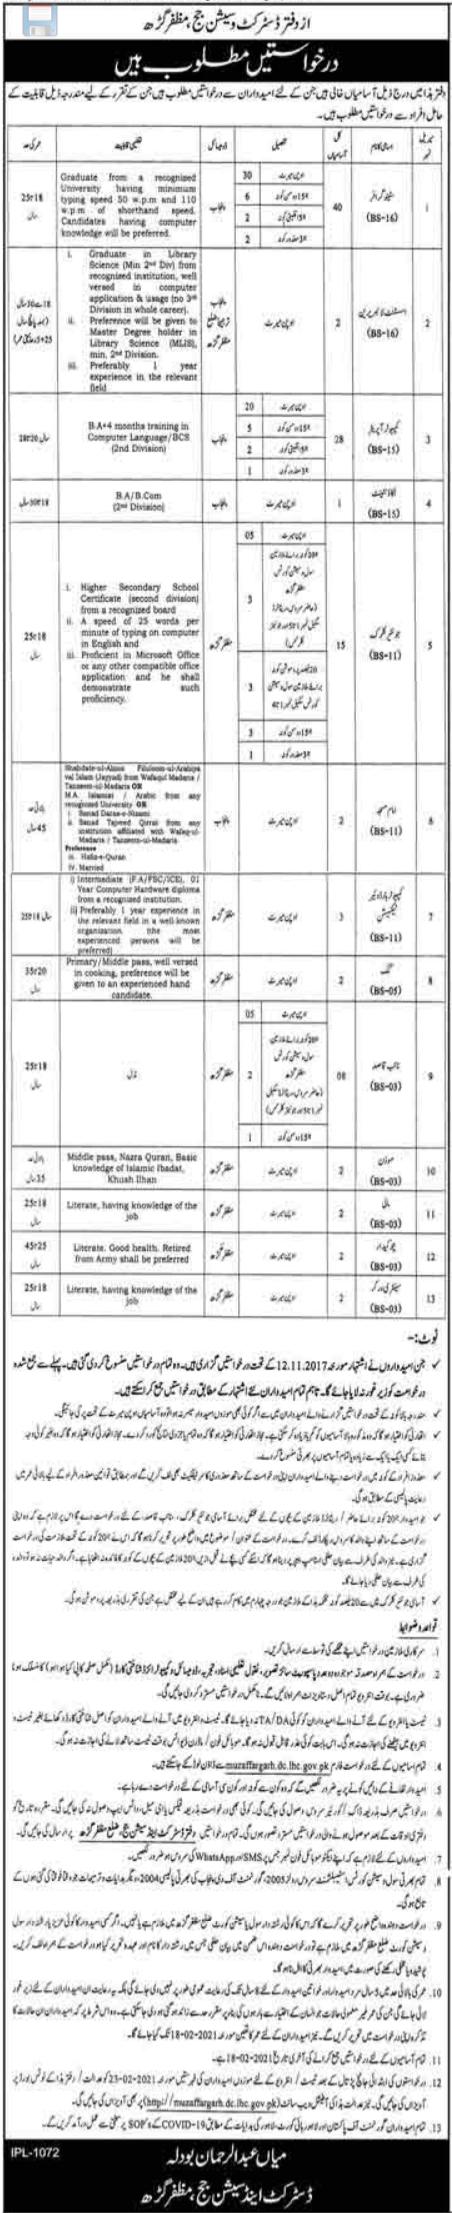 District Session Judge Office Muzaffargarh Jobs